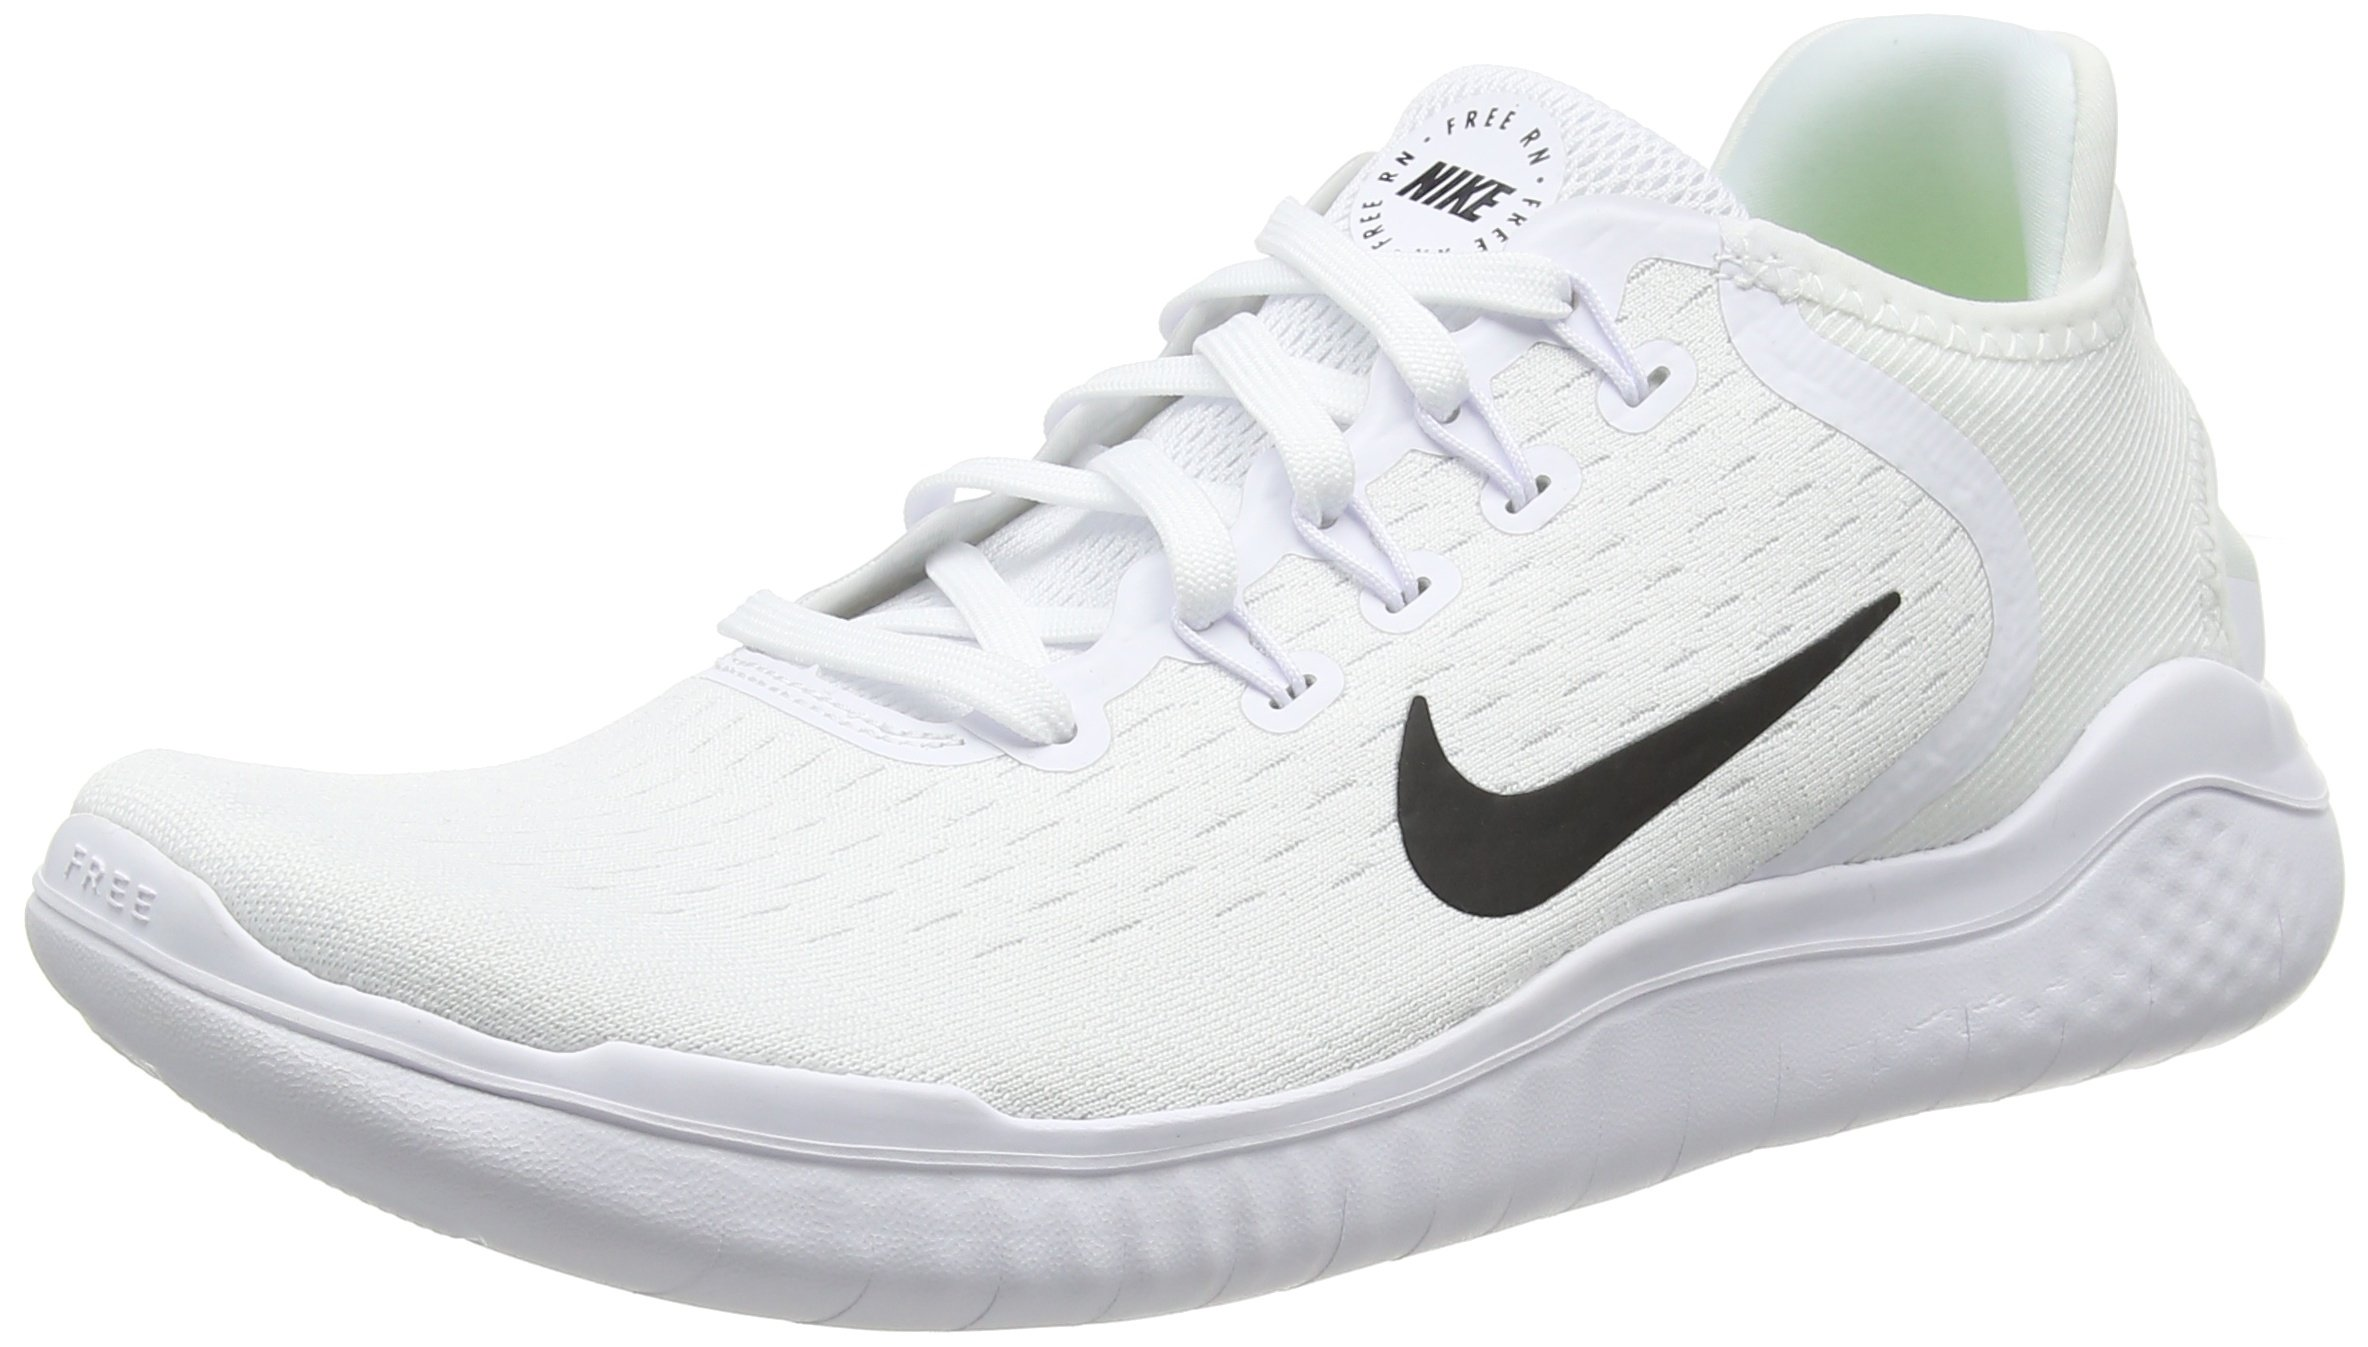 f1d76cce2751 Galleon - NIKE Men s Free RN 2018 Running Shoe White Black Size 8.5 M US